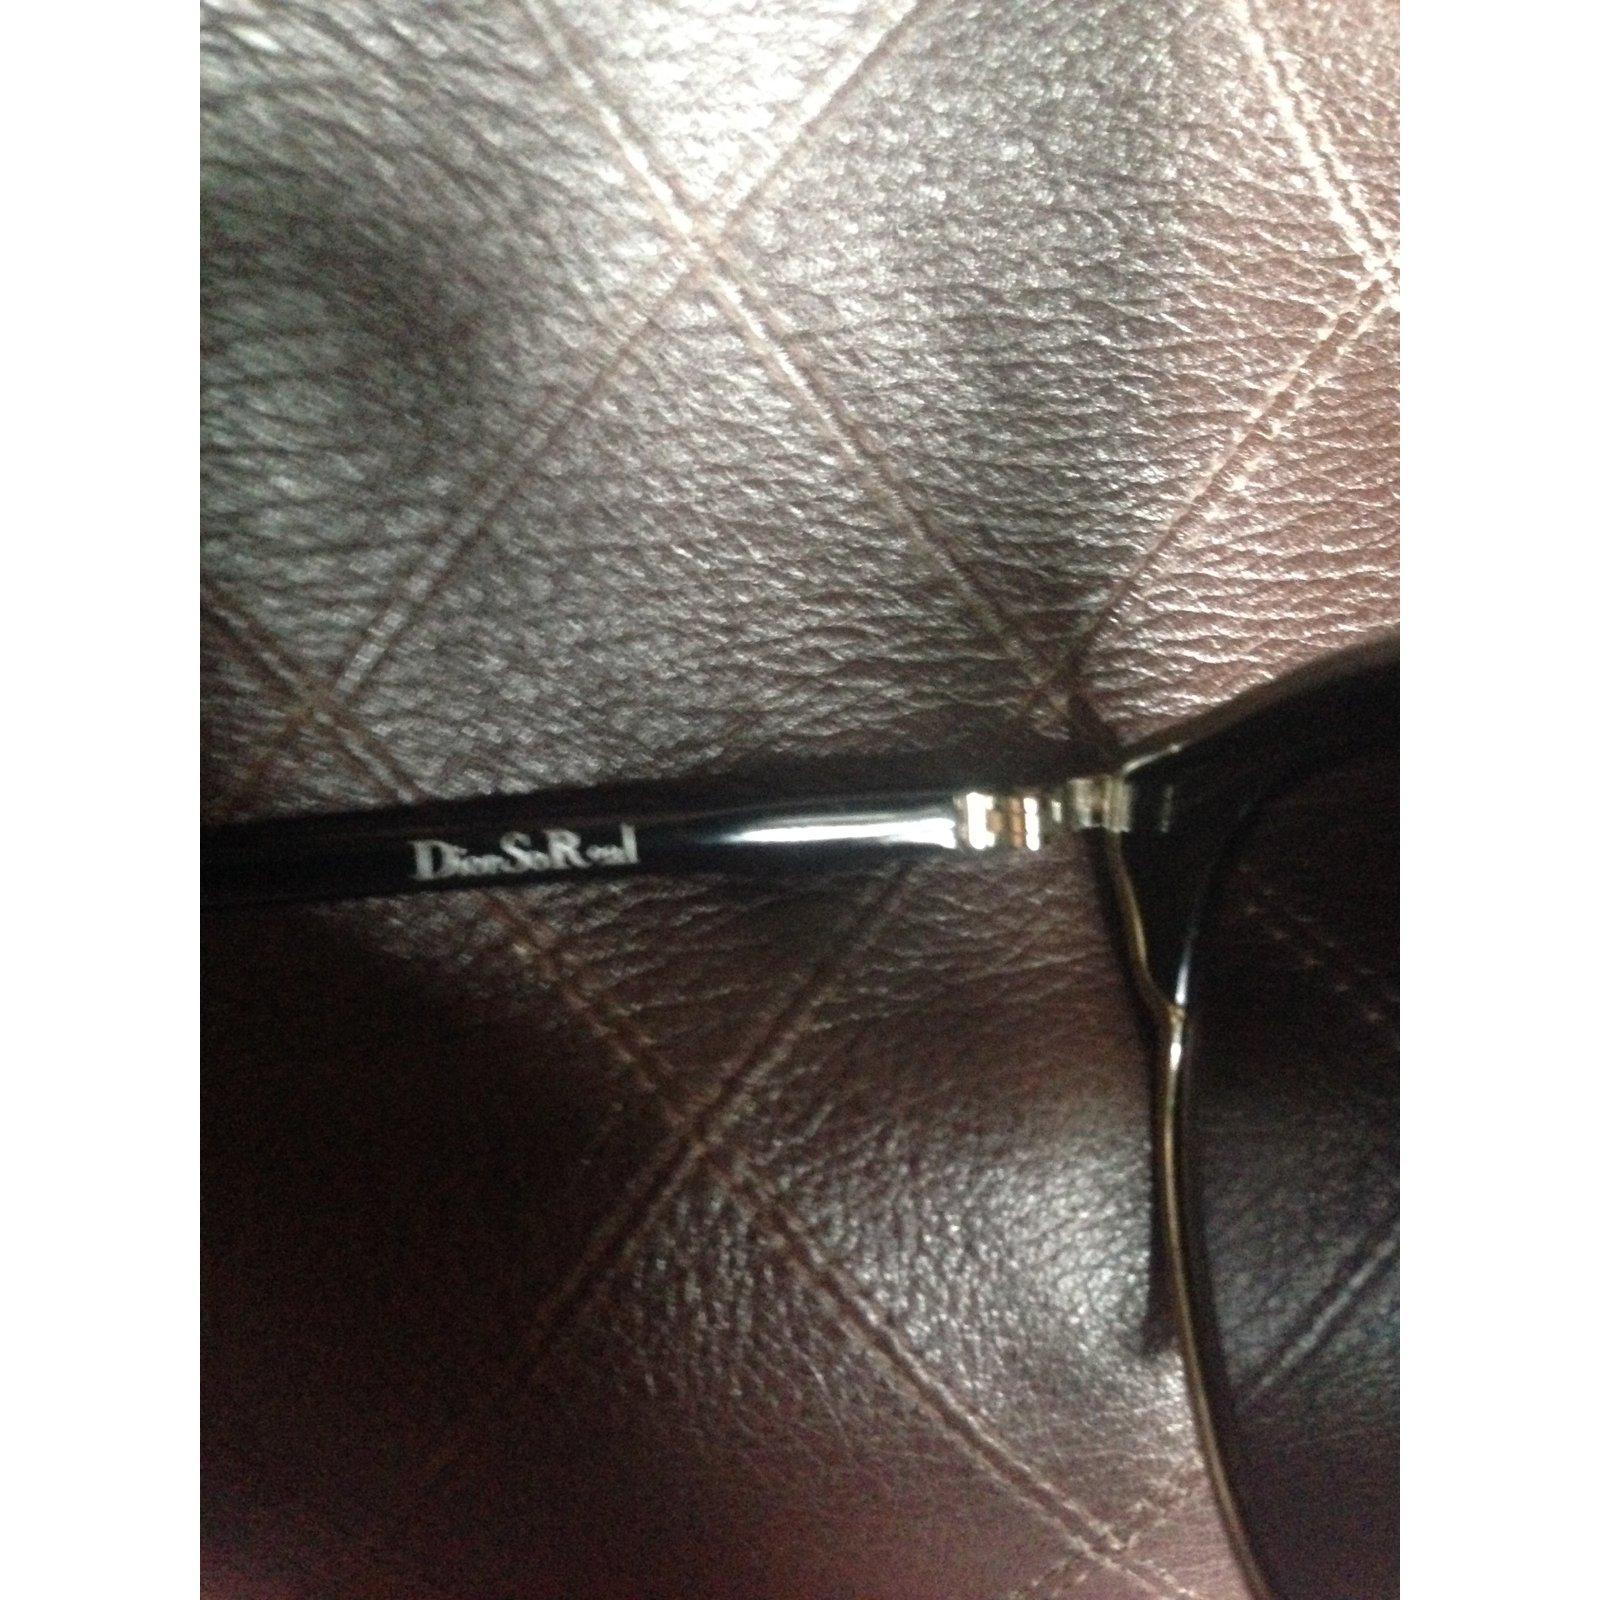 6583a7a688b Christian Dior Glasses DIOR SO REAL black and silver Sunglasses Silver-plated  Black ref.69091 - Joli Closet